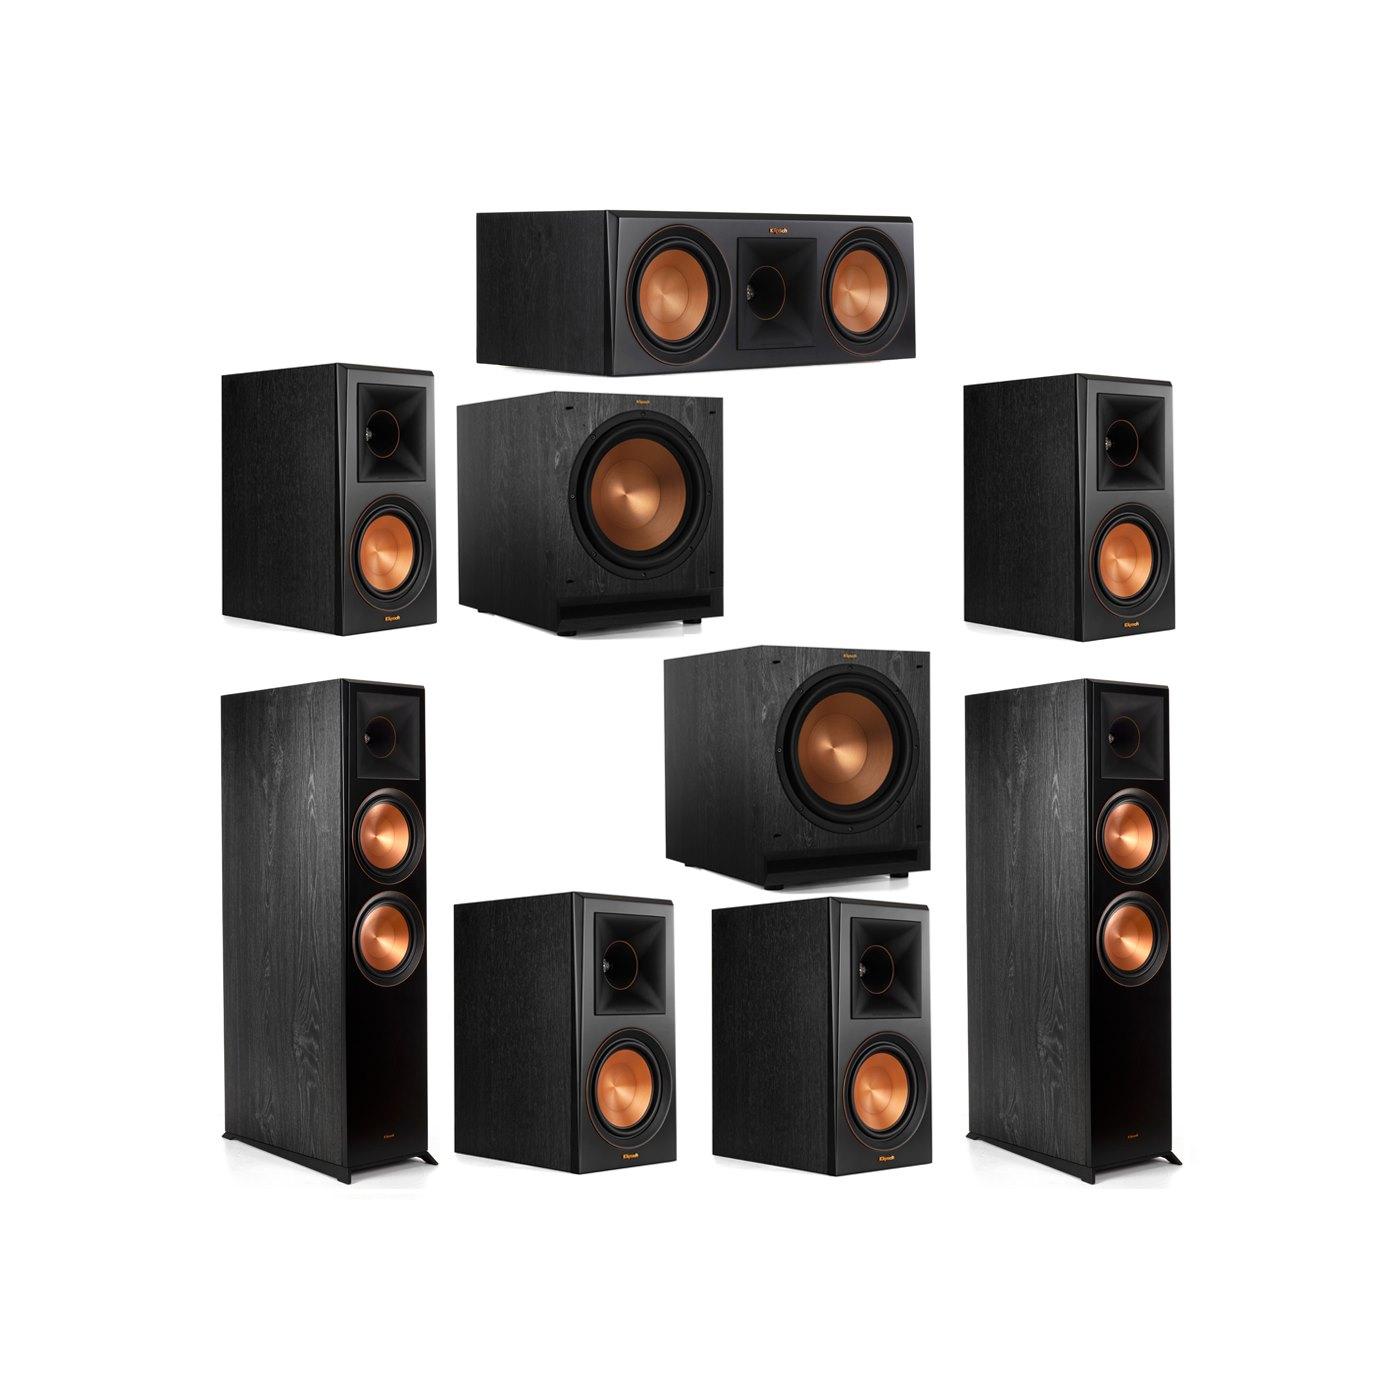 Klipsch 7.2 System with 2 RP-8000F Floorstanding Speakers, 1 Klipsch RP-600C Center Speaker, 4 Klipsch RP-600M Surround Speakers, 2 Klipsch SPL-120 Subwoofers